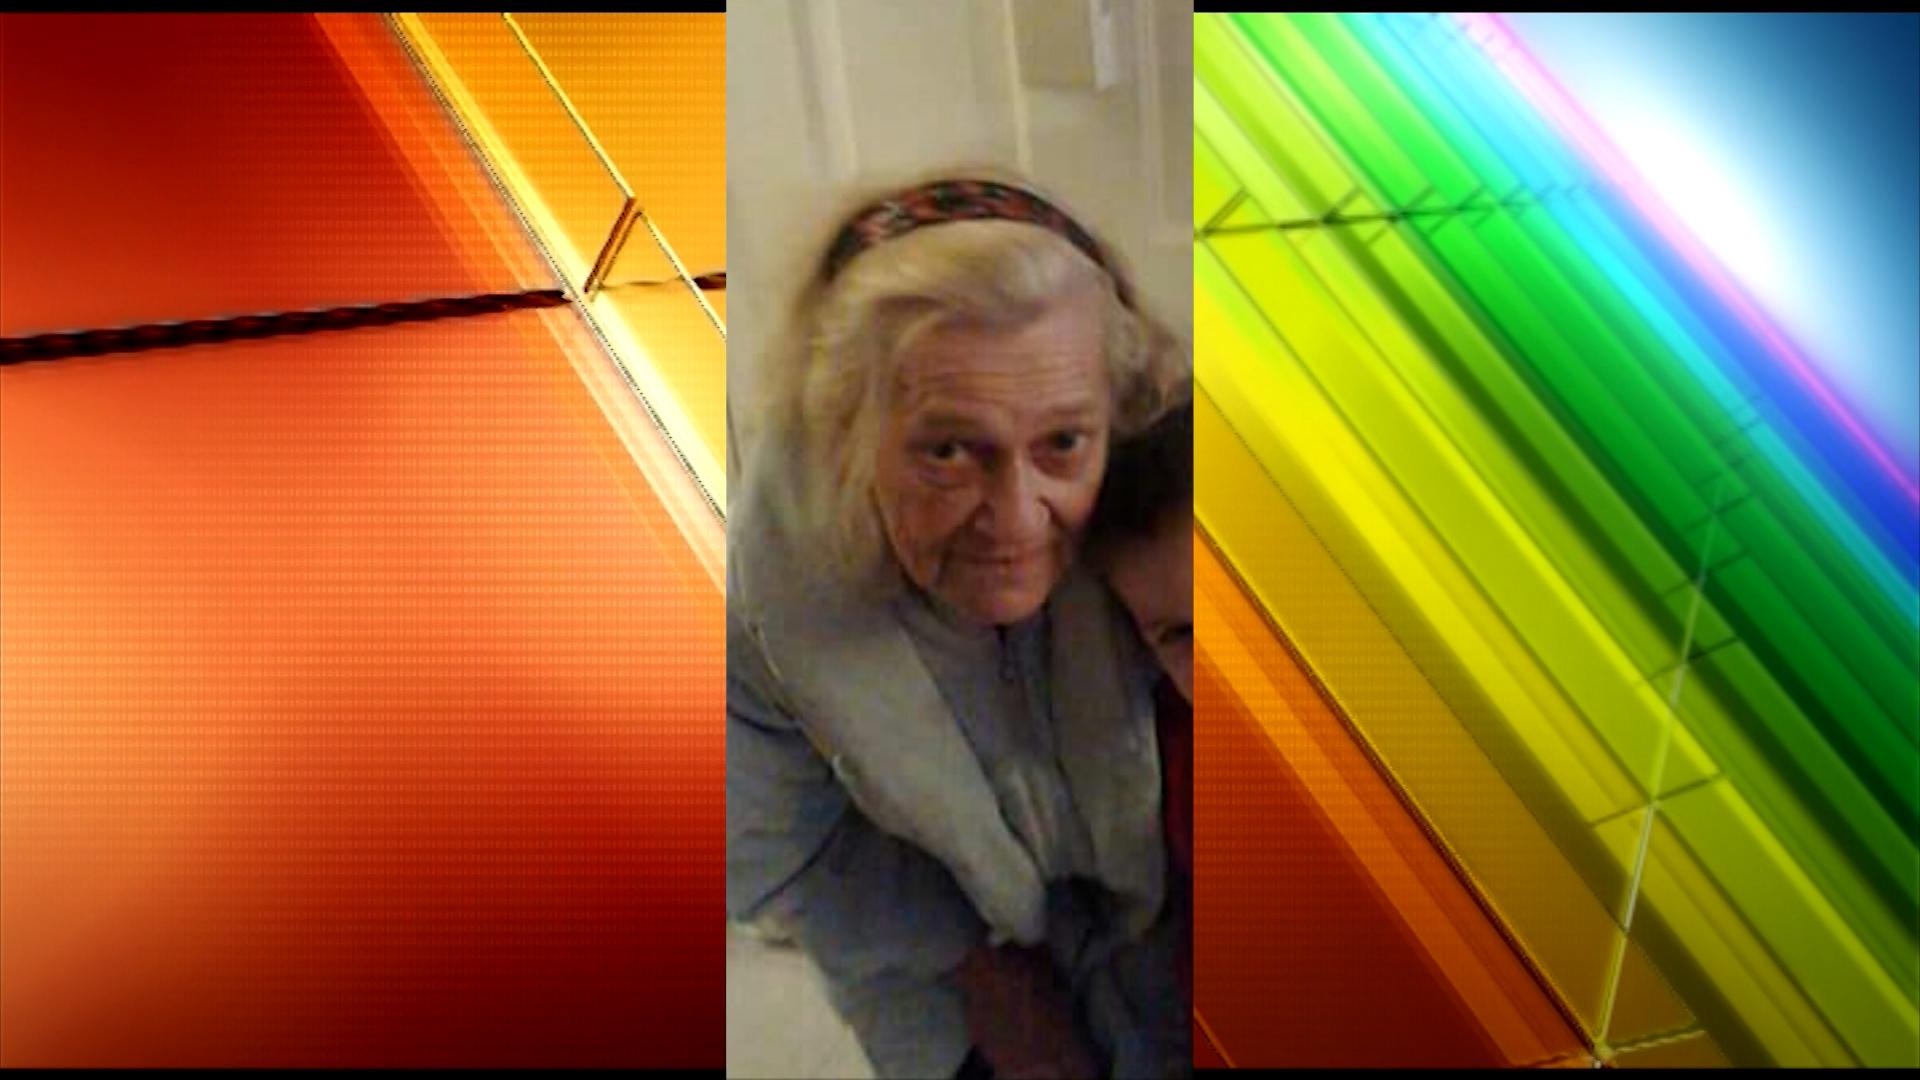 missingwoman_1477917964111-118809198.jpg